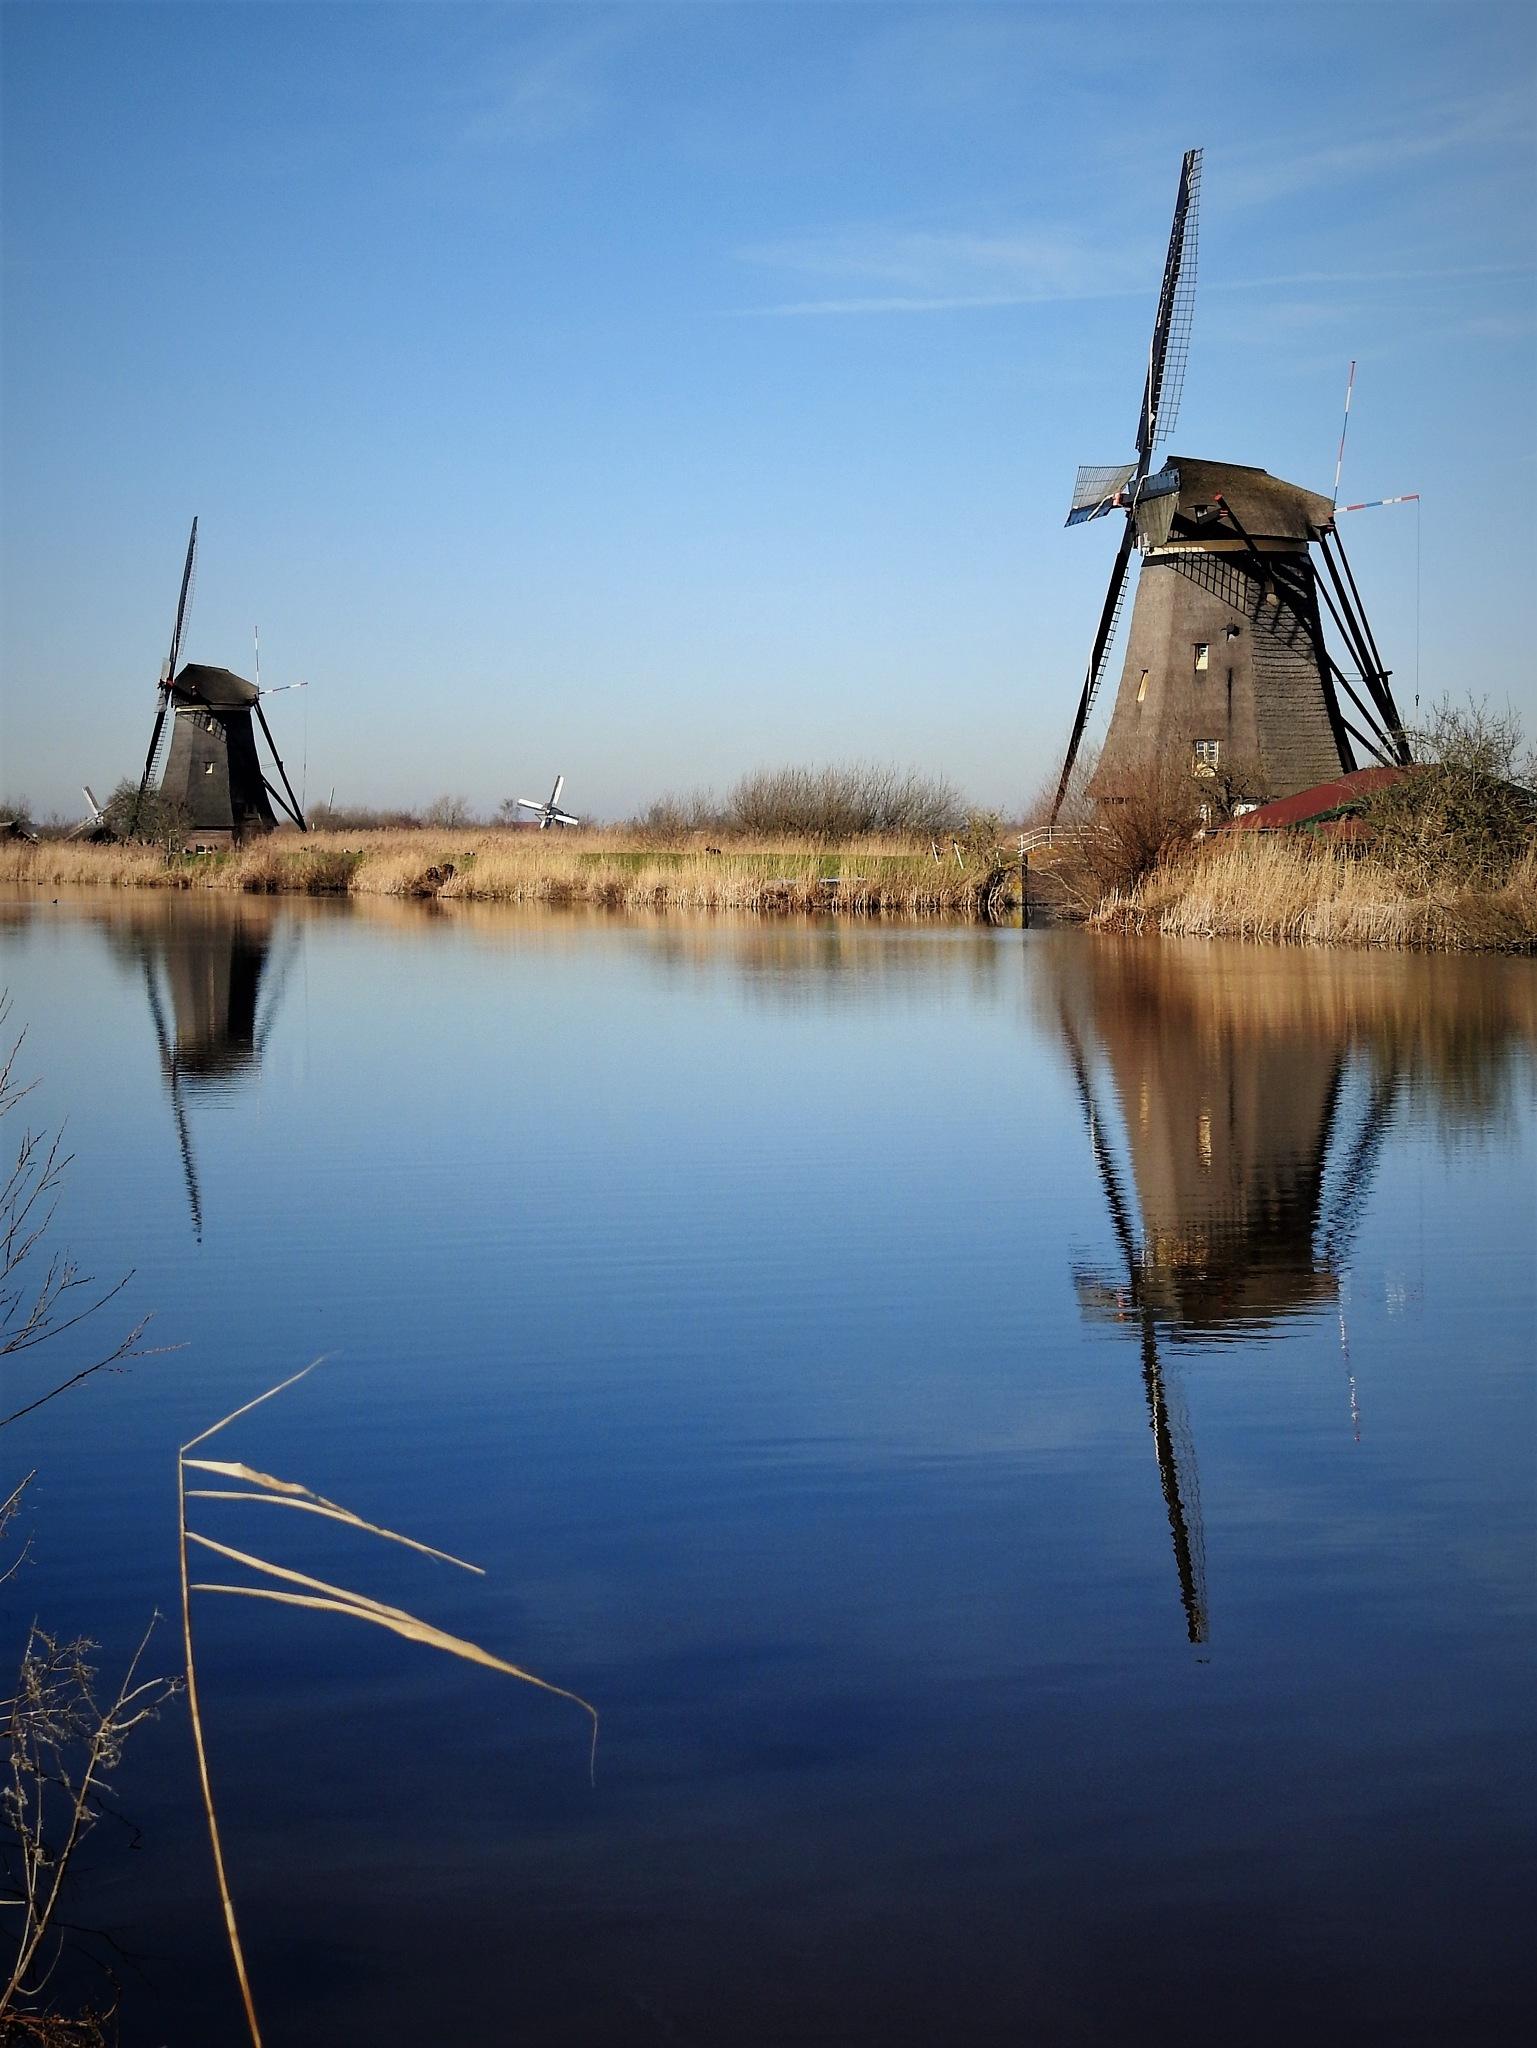 Photo in Landscape #molen #windmolen #mill #mills #wind mills #wind mill #kinderdijk #netherlands #nederland #sunshine #sky #water #reflection #mirror #daylight #sunlight #reed #blue #canal #travel #landscape #landscapes #landmark